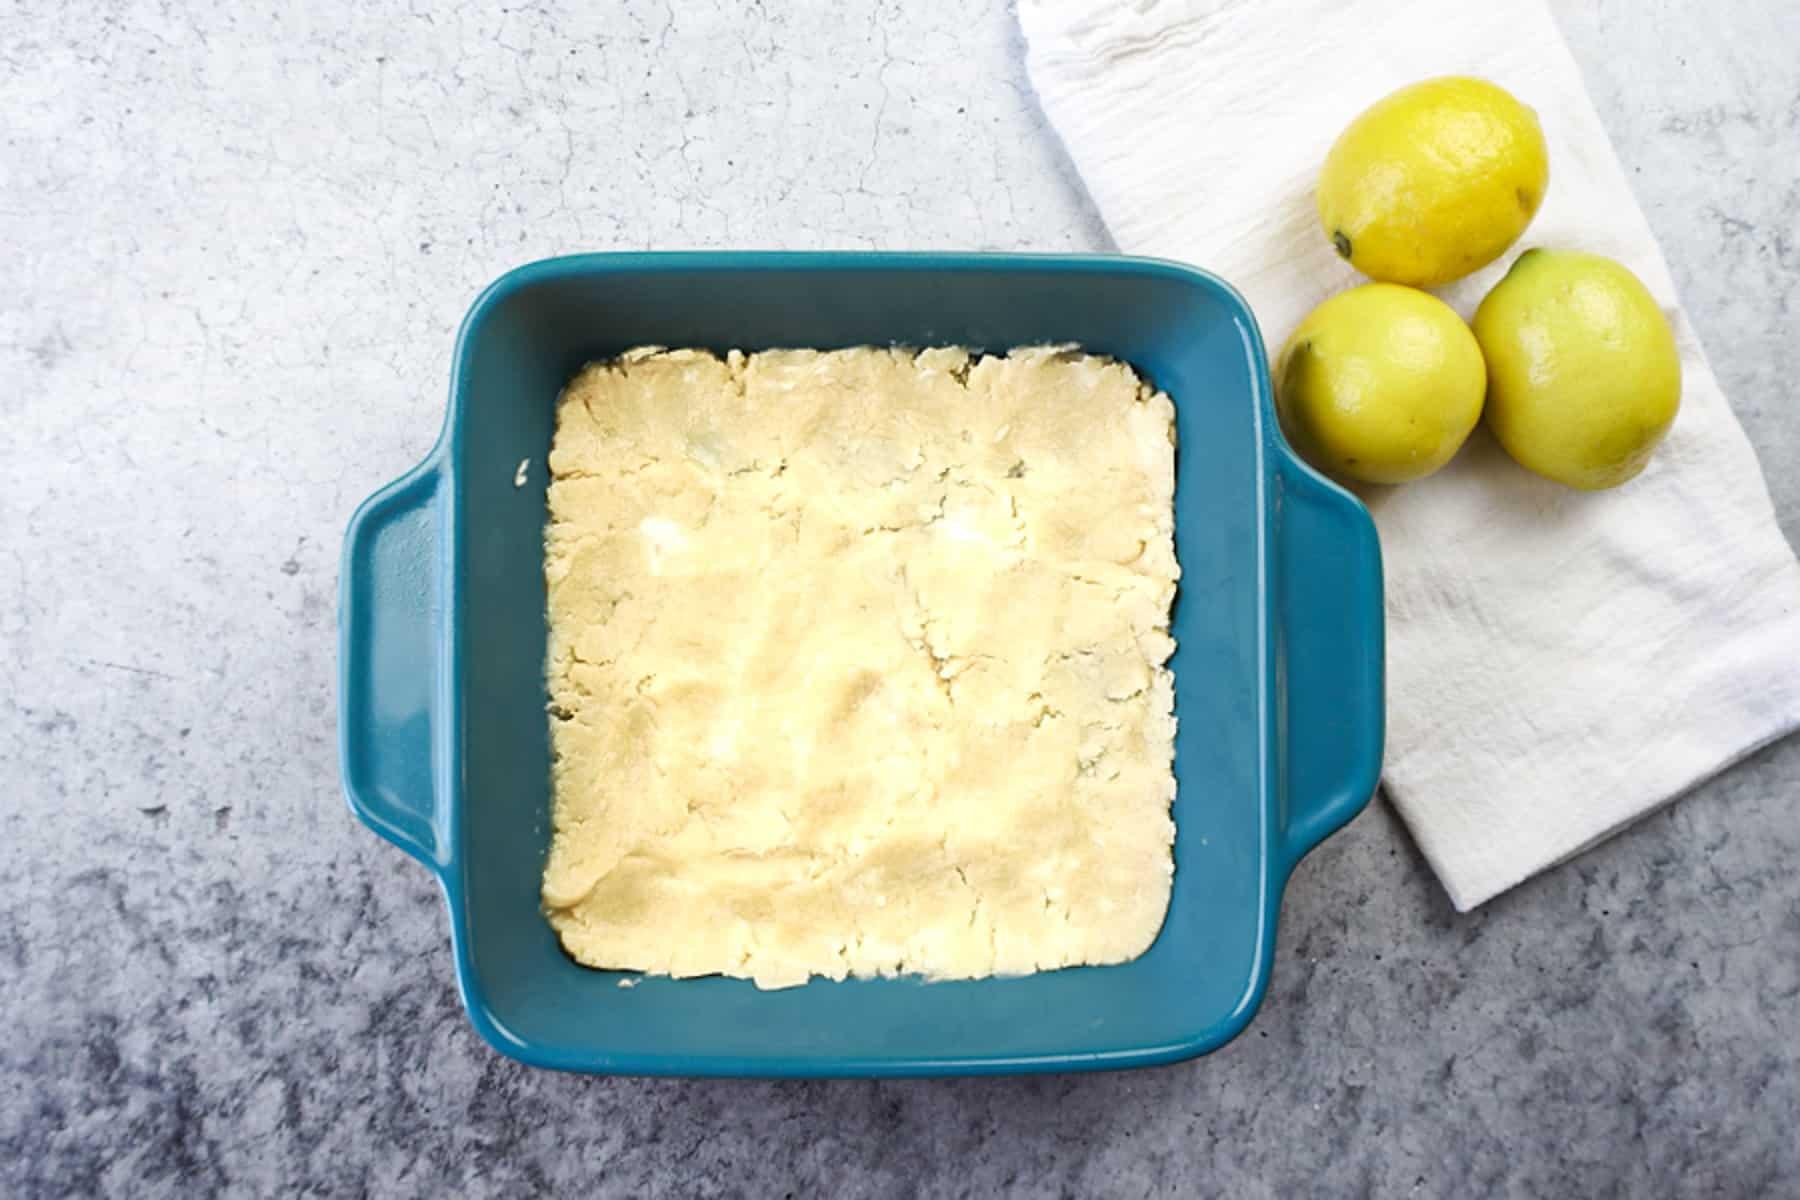 crust before baking